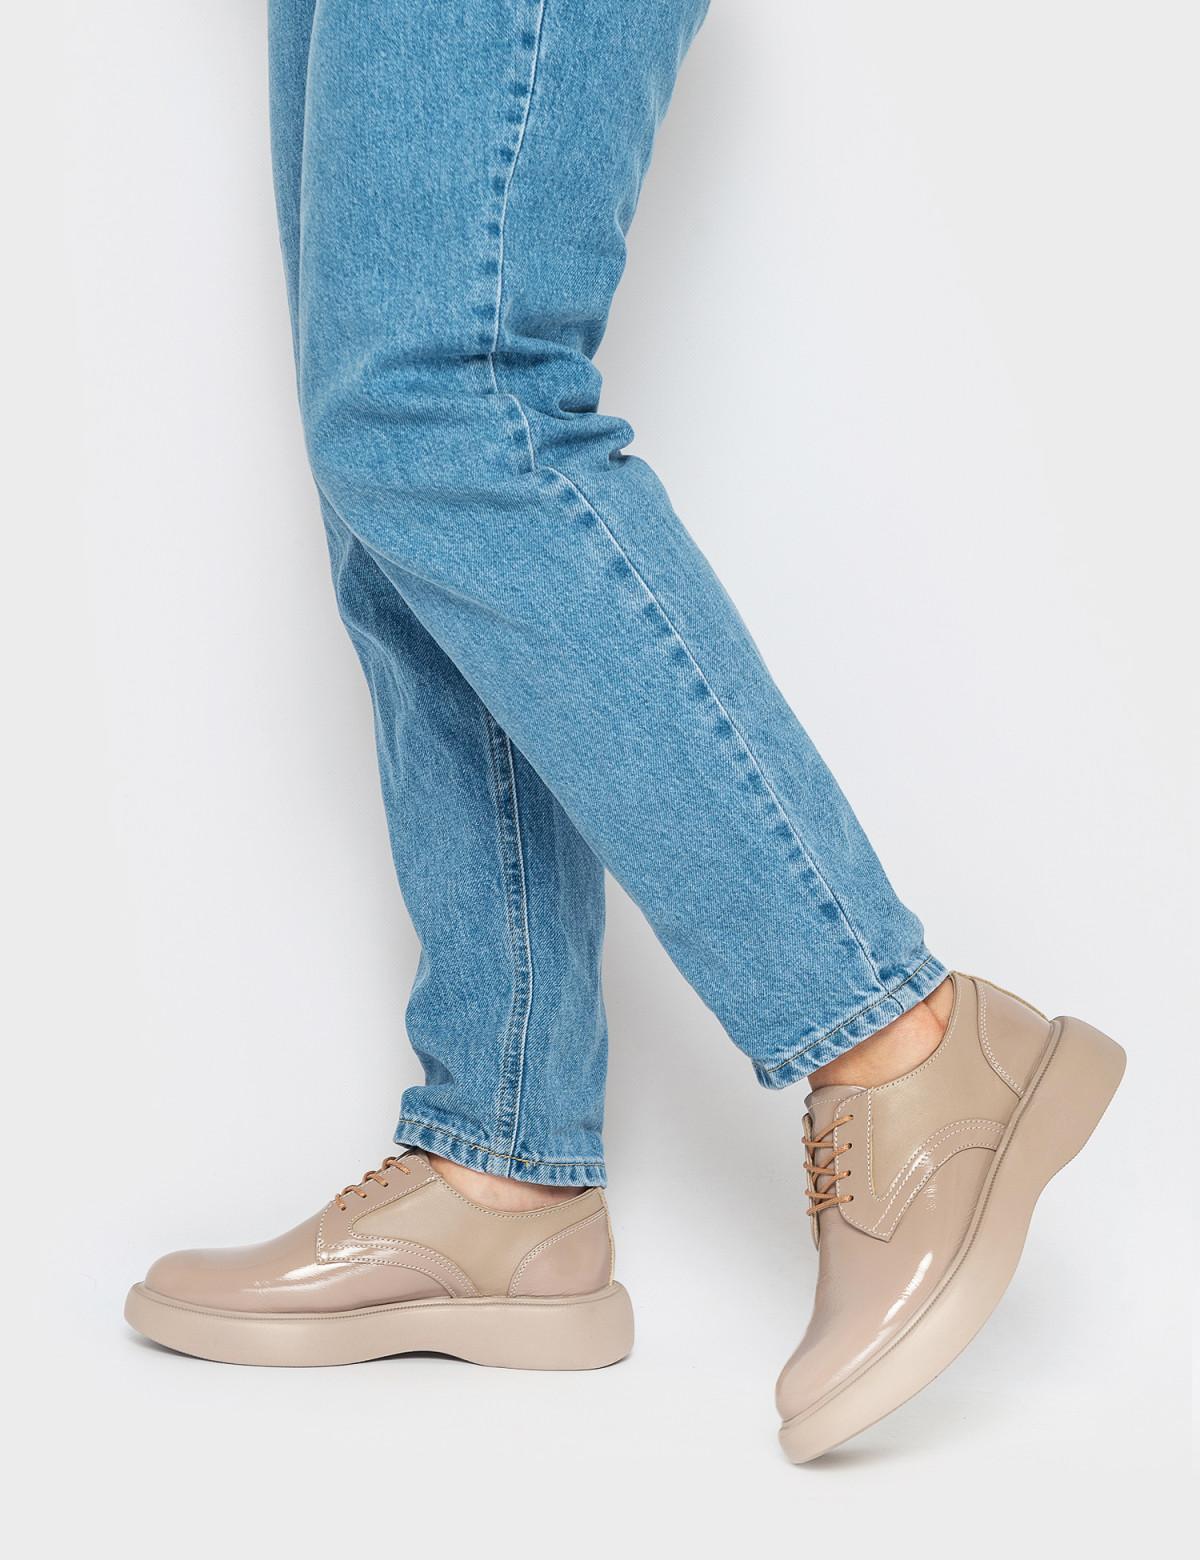 Туфлі бежеві. Натуральна шкіра4